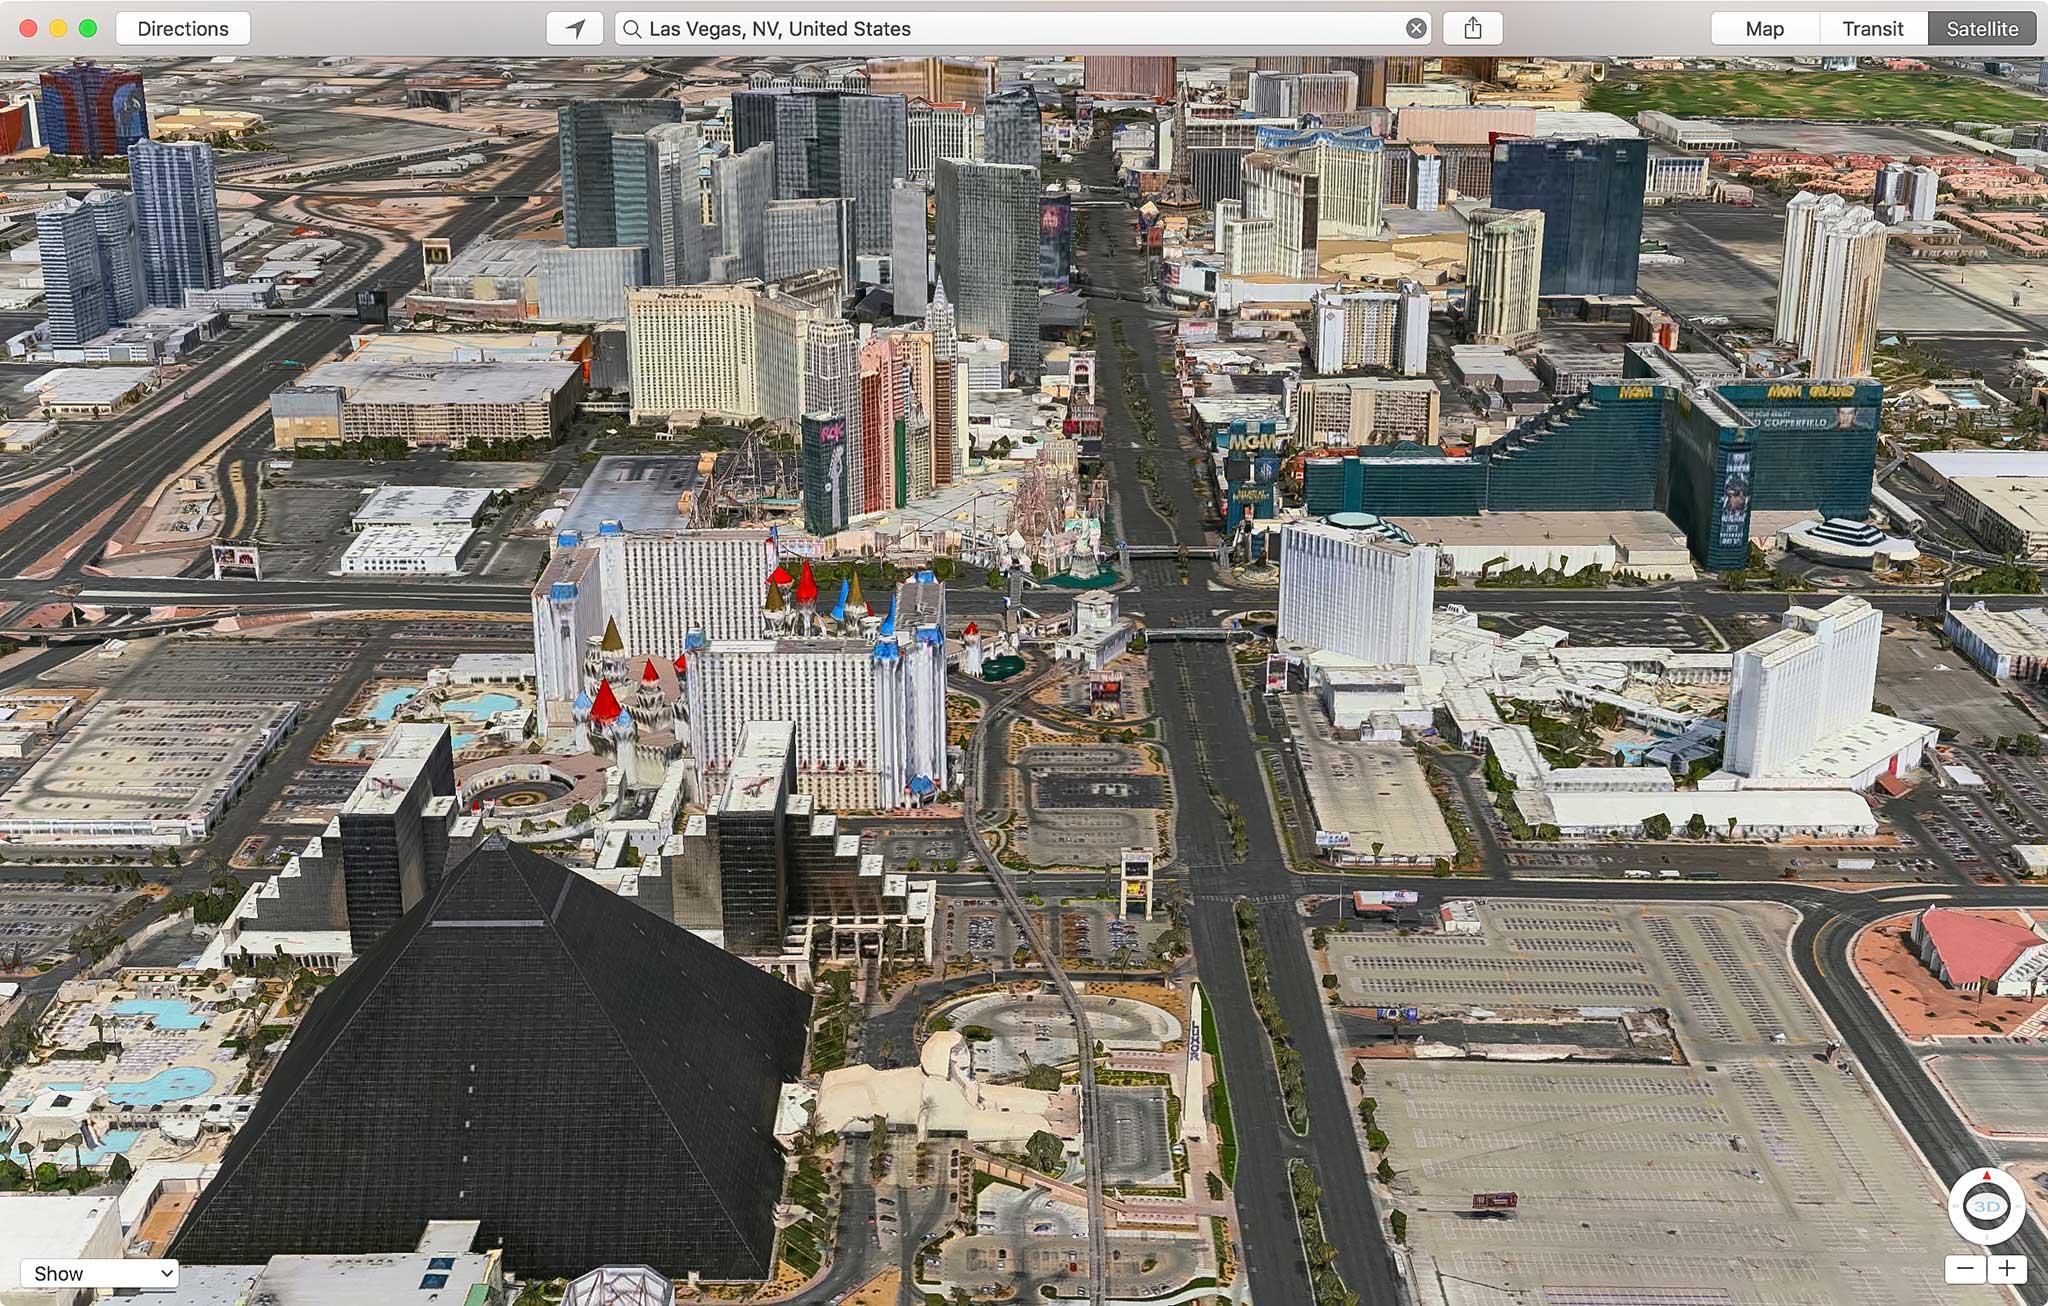 Las Vegas, Mỹ.